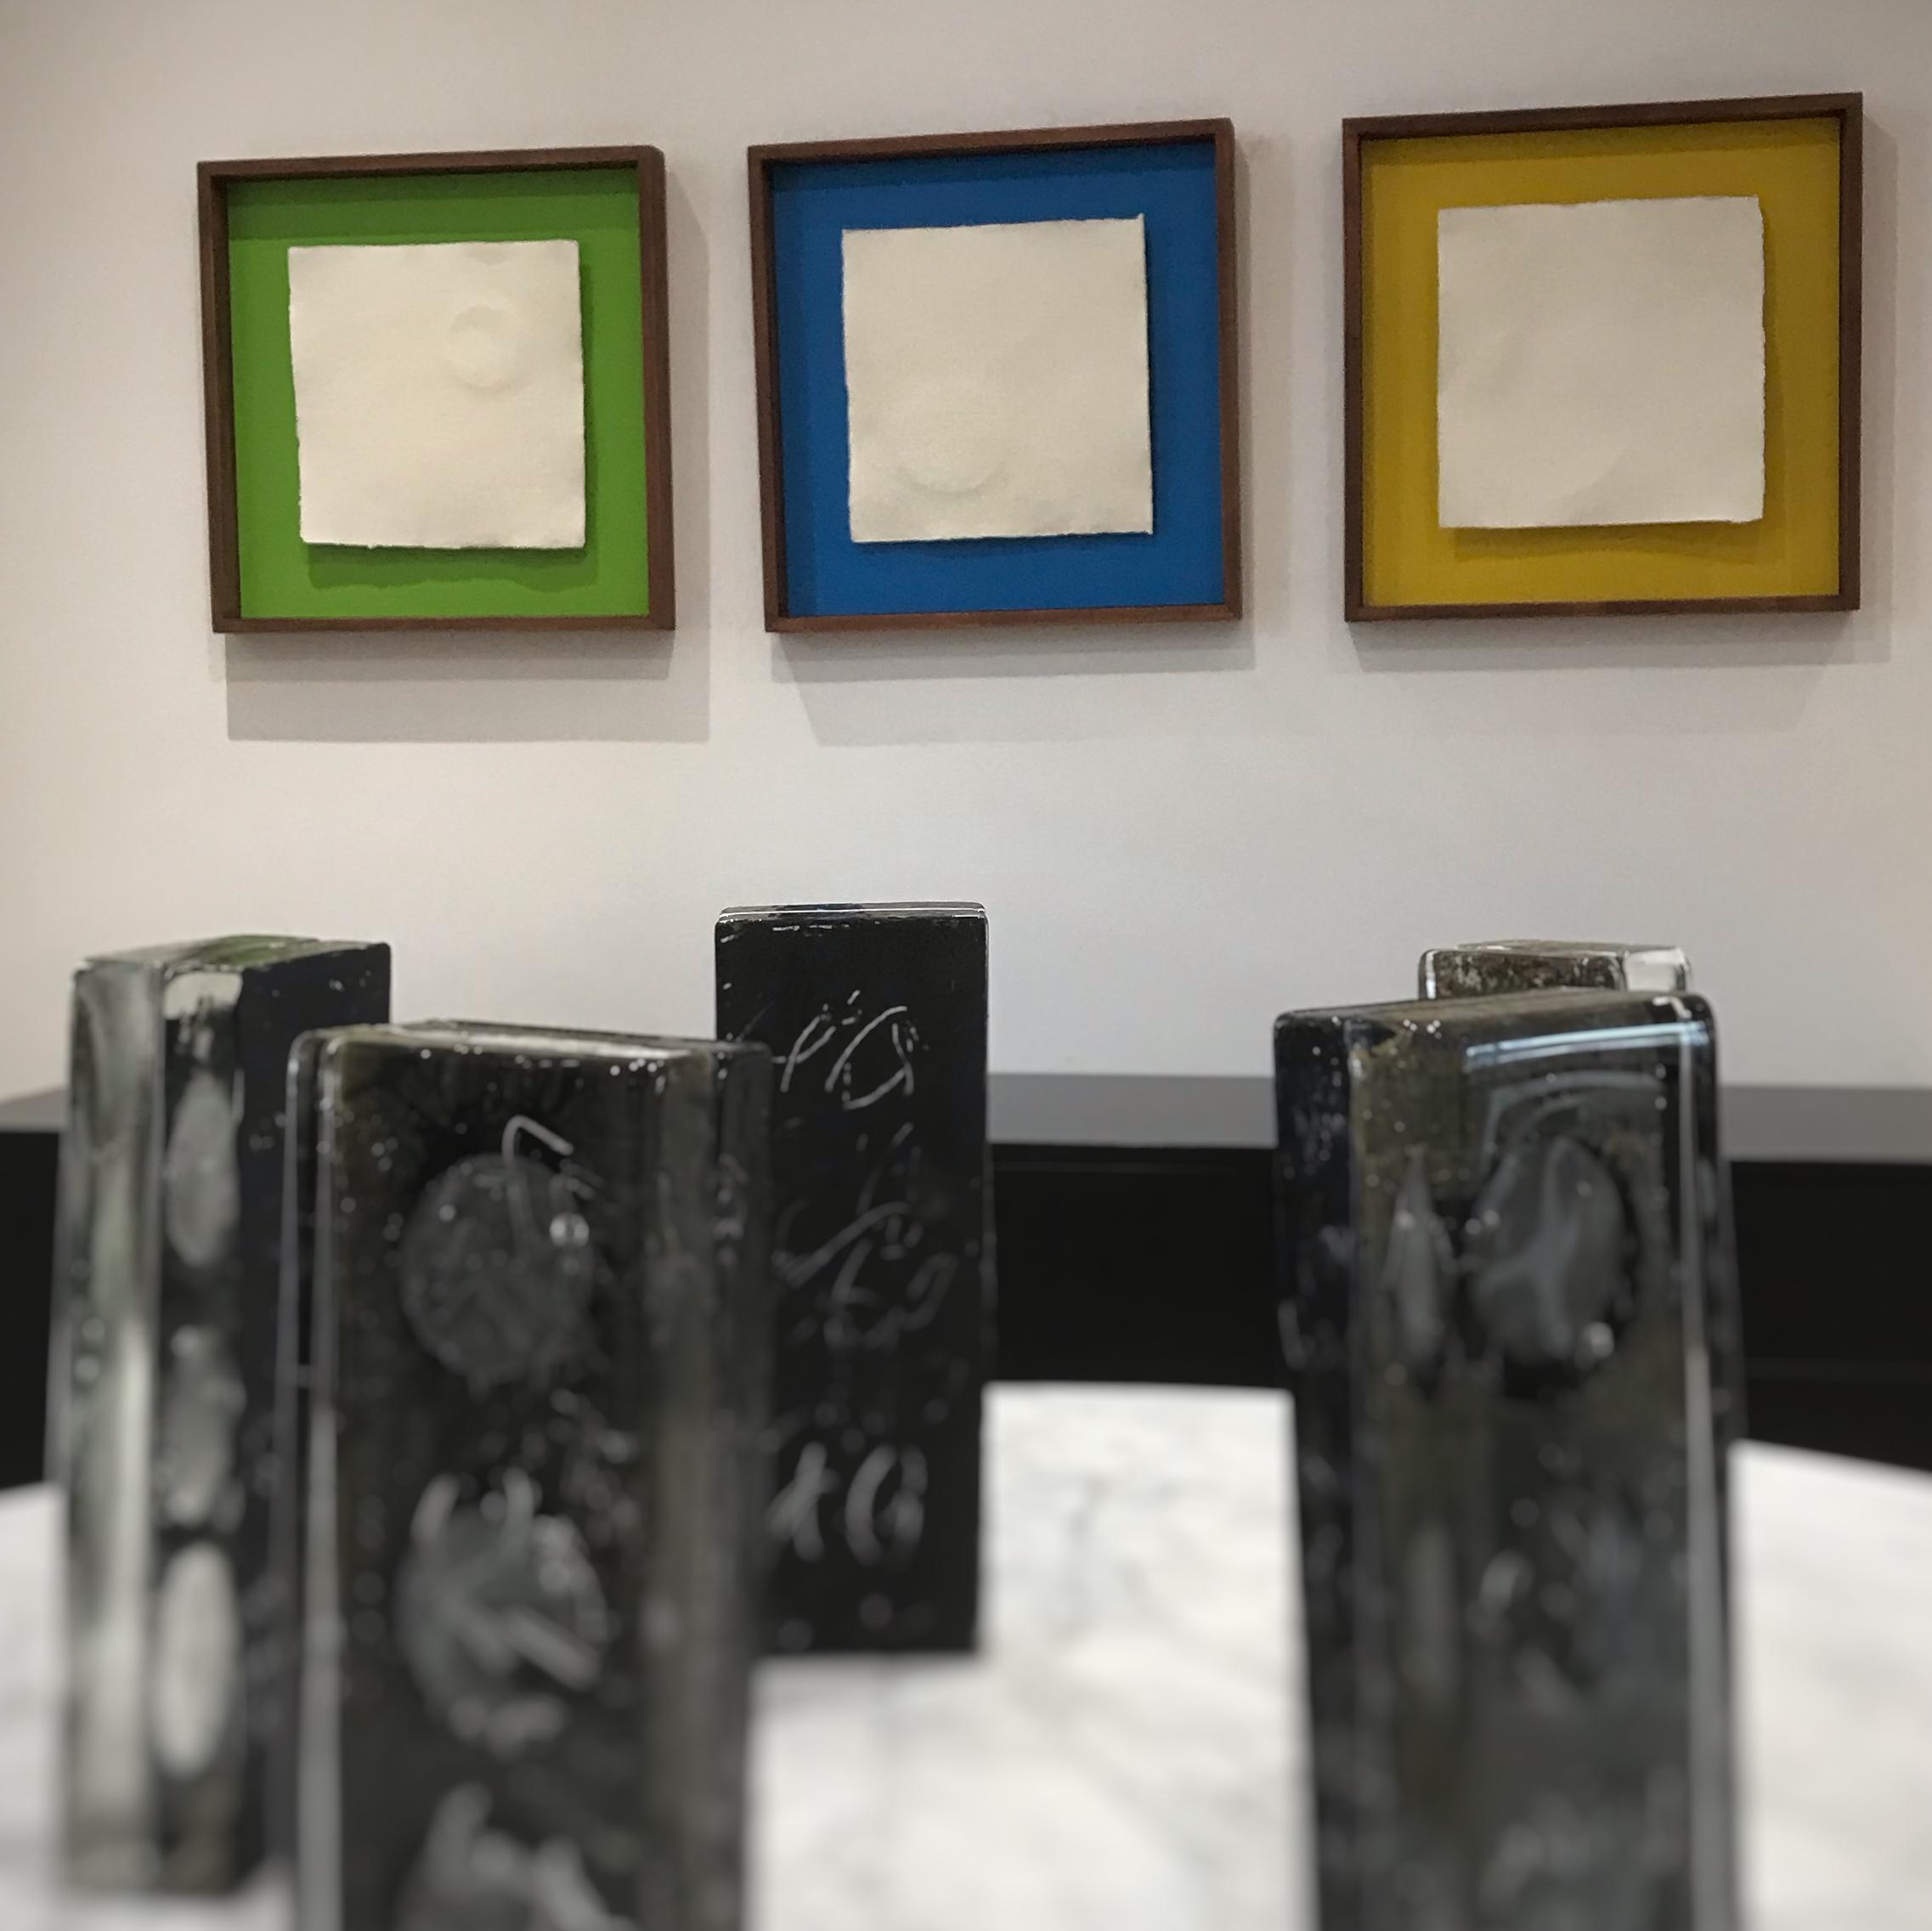 Glass Henge with Zero Space paper sculptures behind